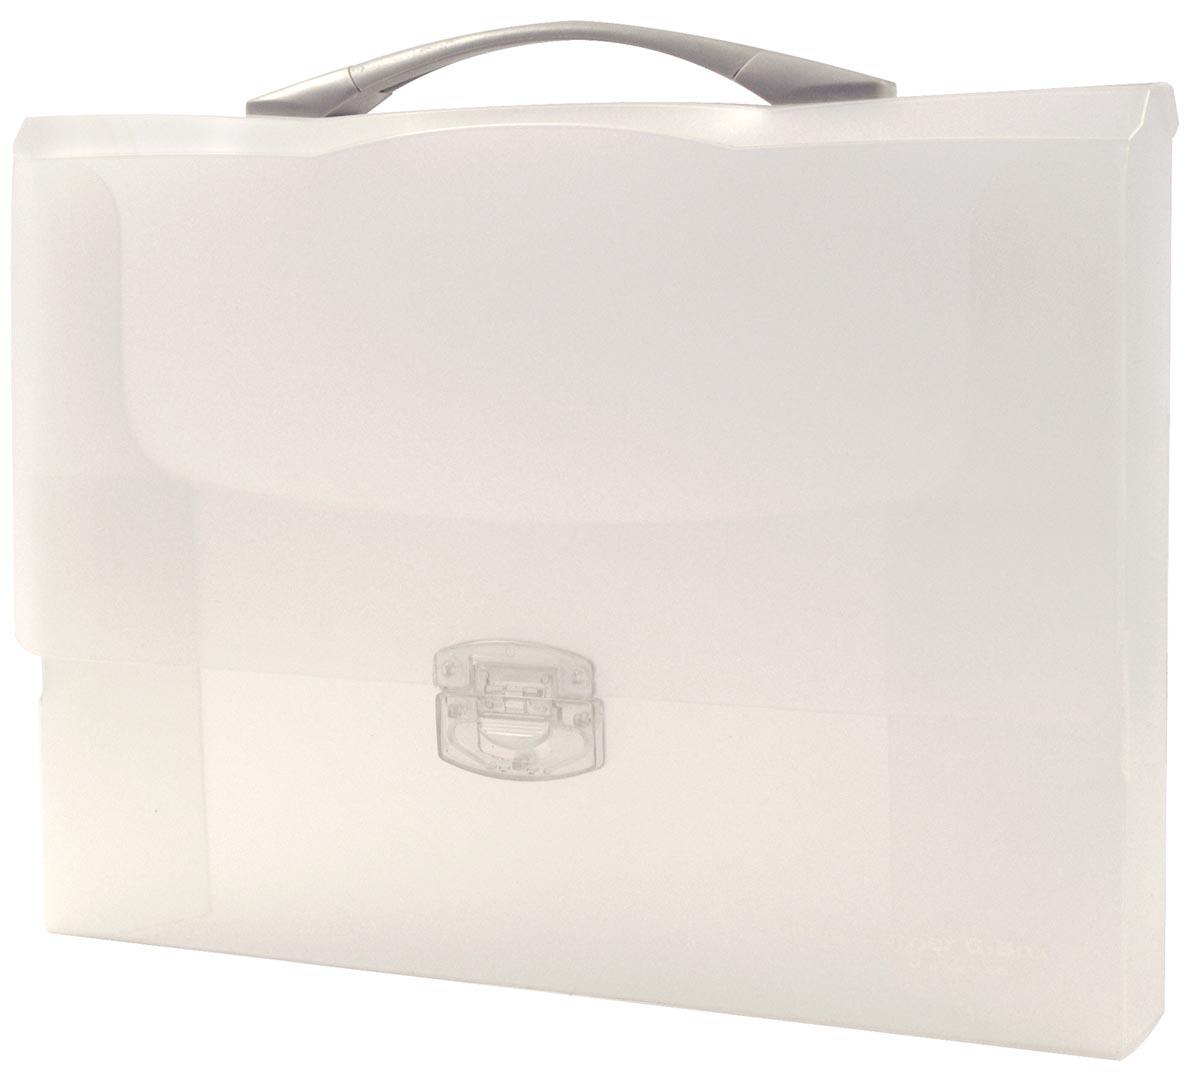 Beautone Voorordner 44684 Transparant wit